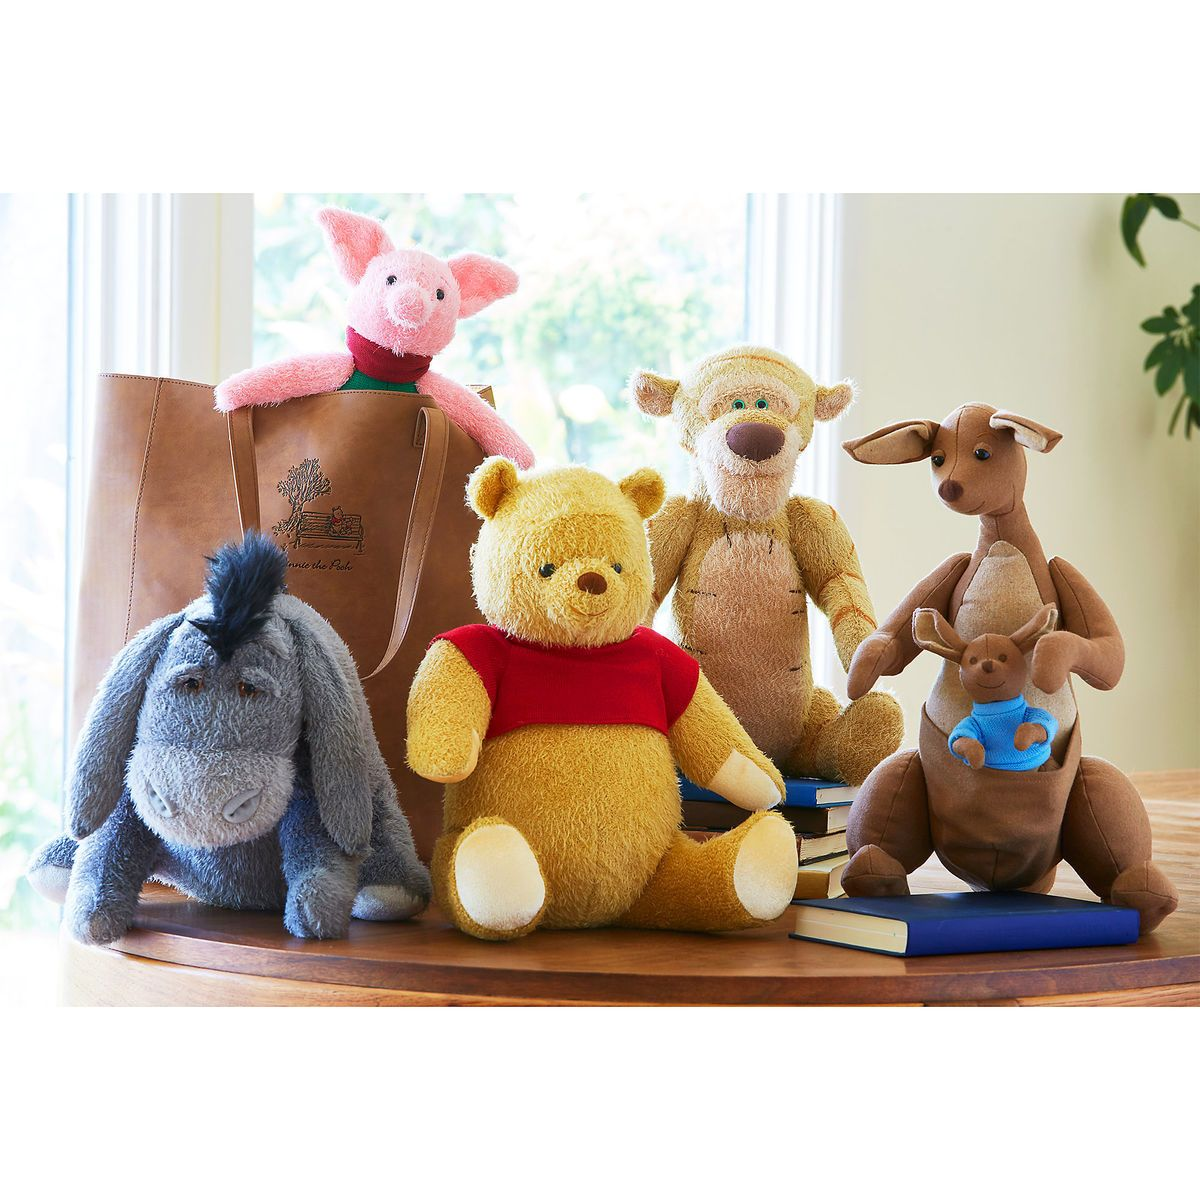 Tigger Plush – Christopher Robin – Medium | Winnie the pooh